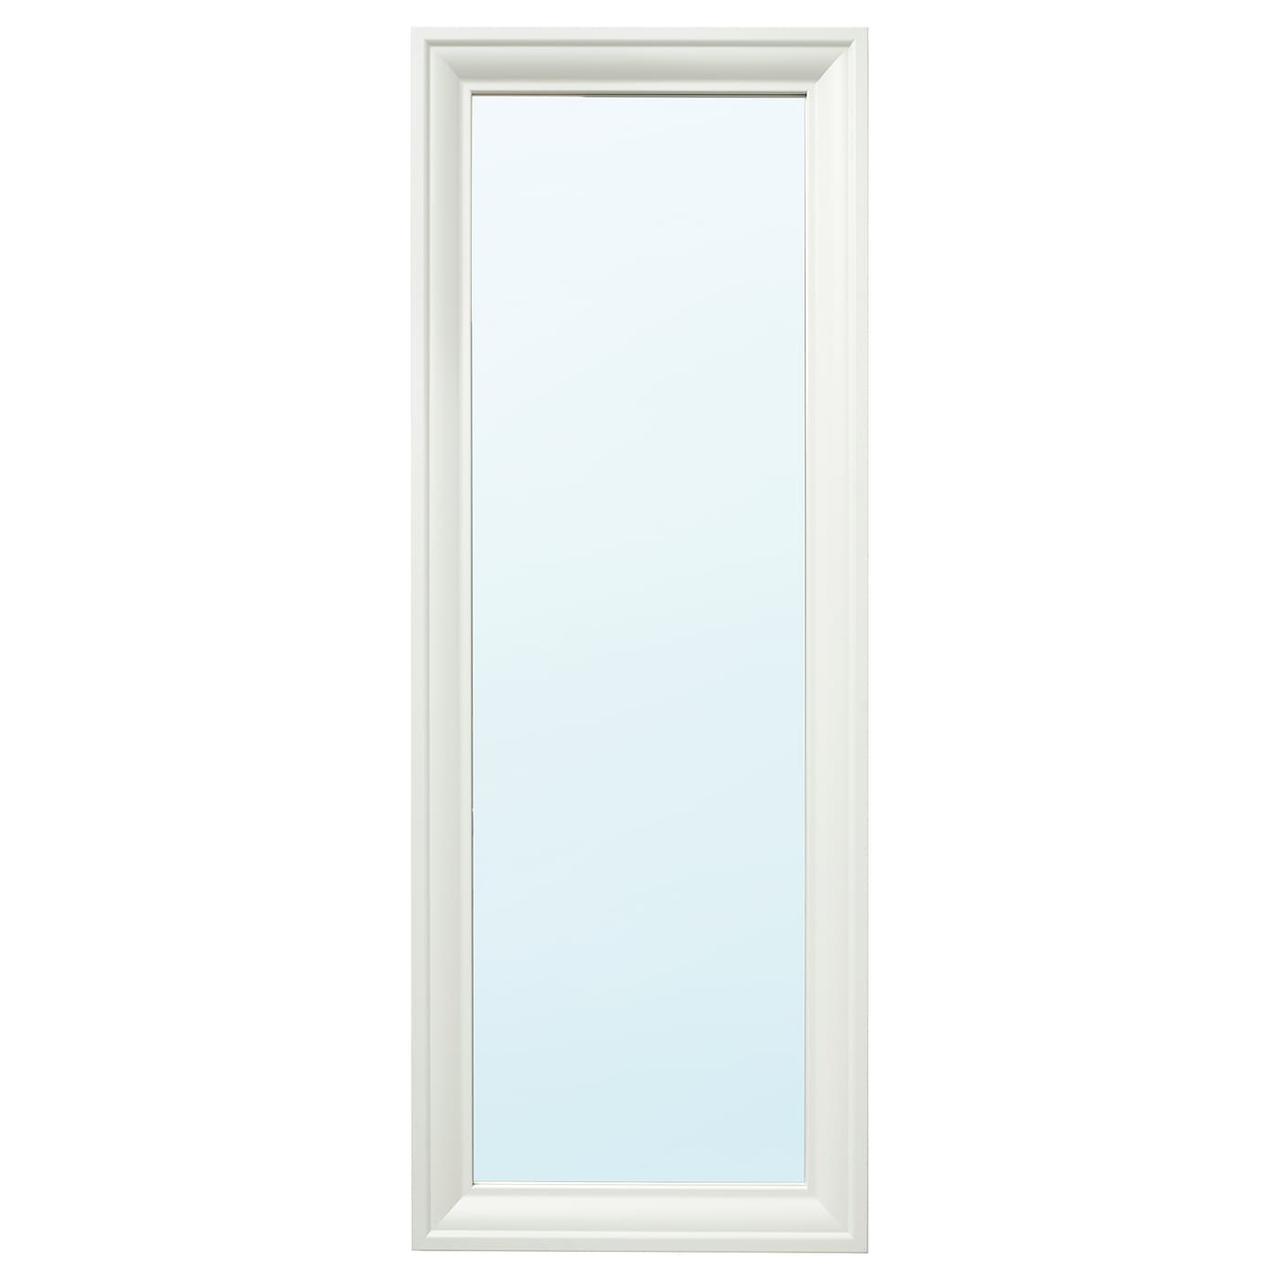 IKEA TOFTBYN Зеркало 52x140 см